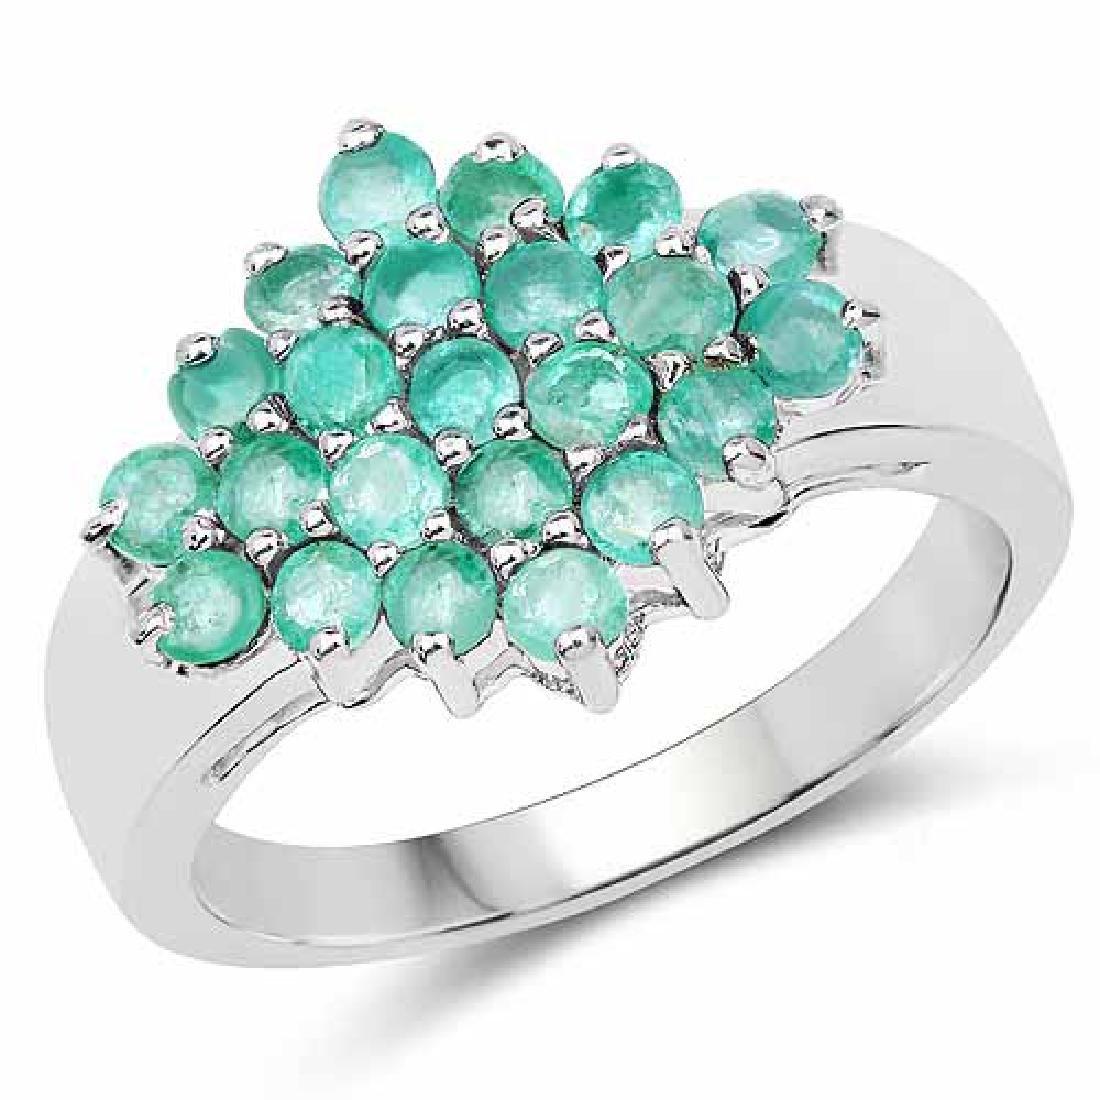 1.61 Carat Genuine Zambian Emerald .925 Sterling Silver